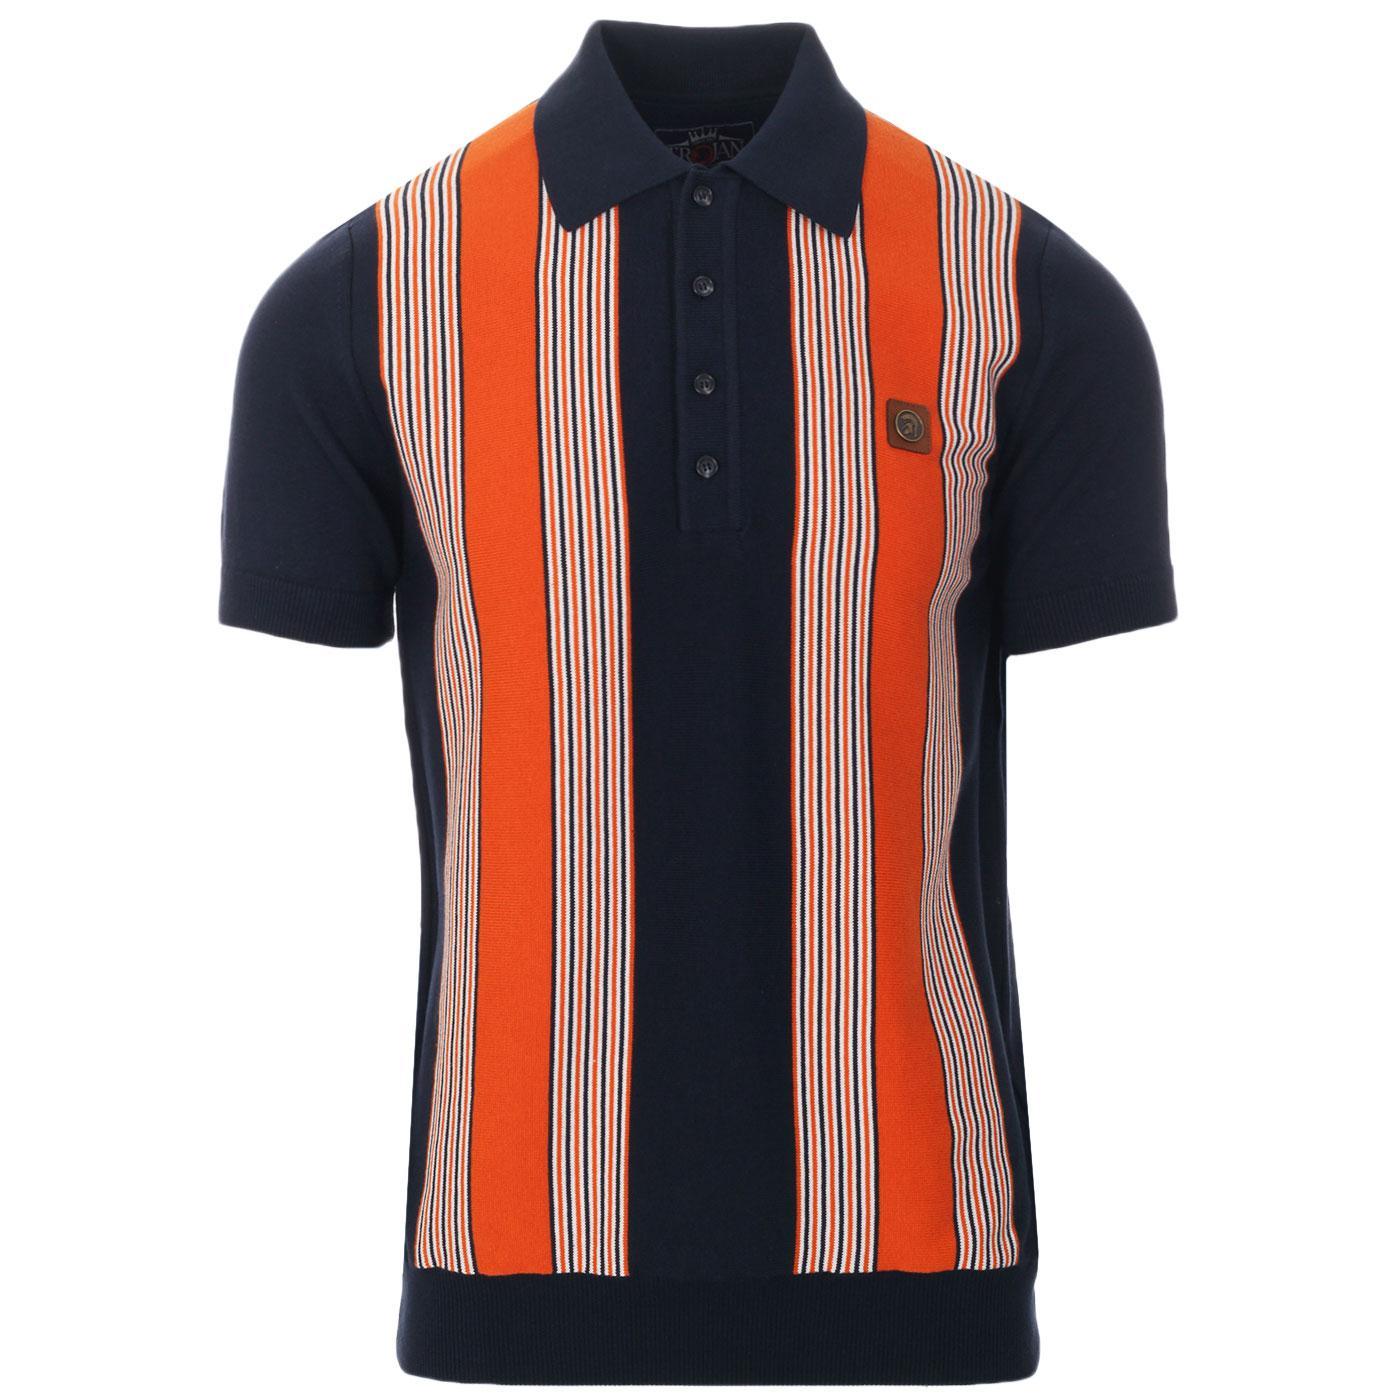 TROJAN RECORDS Ska Mod Stripe Knit Polo Top (Navy)